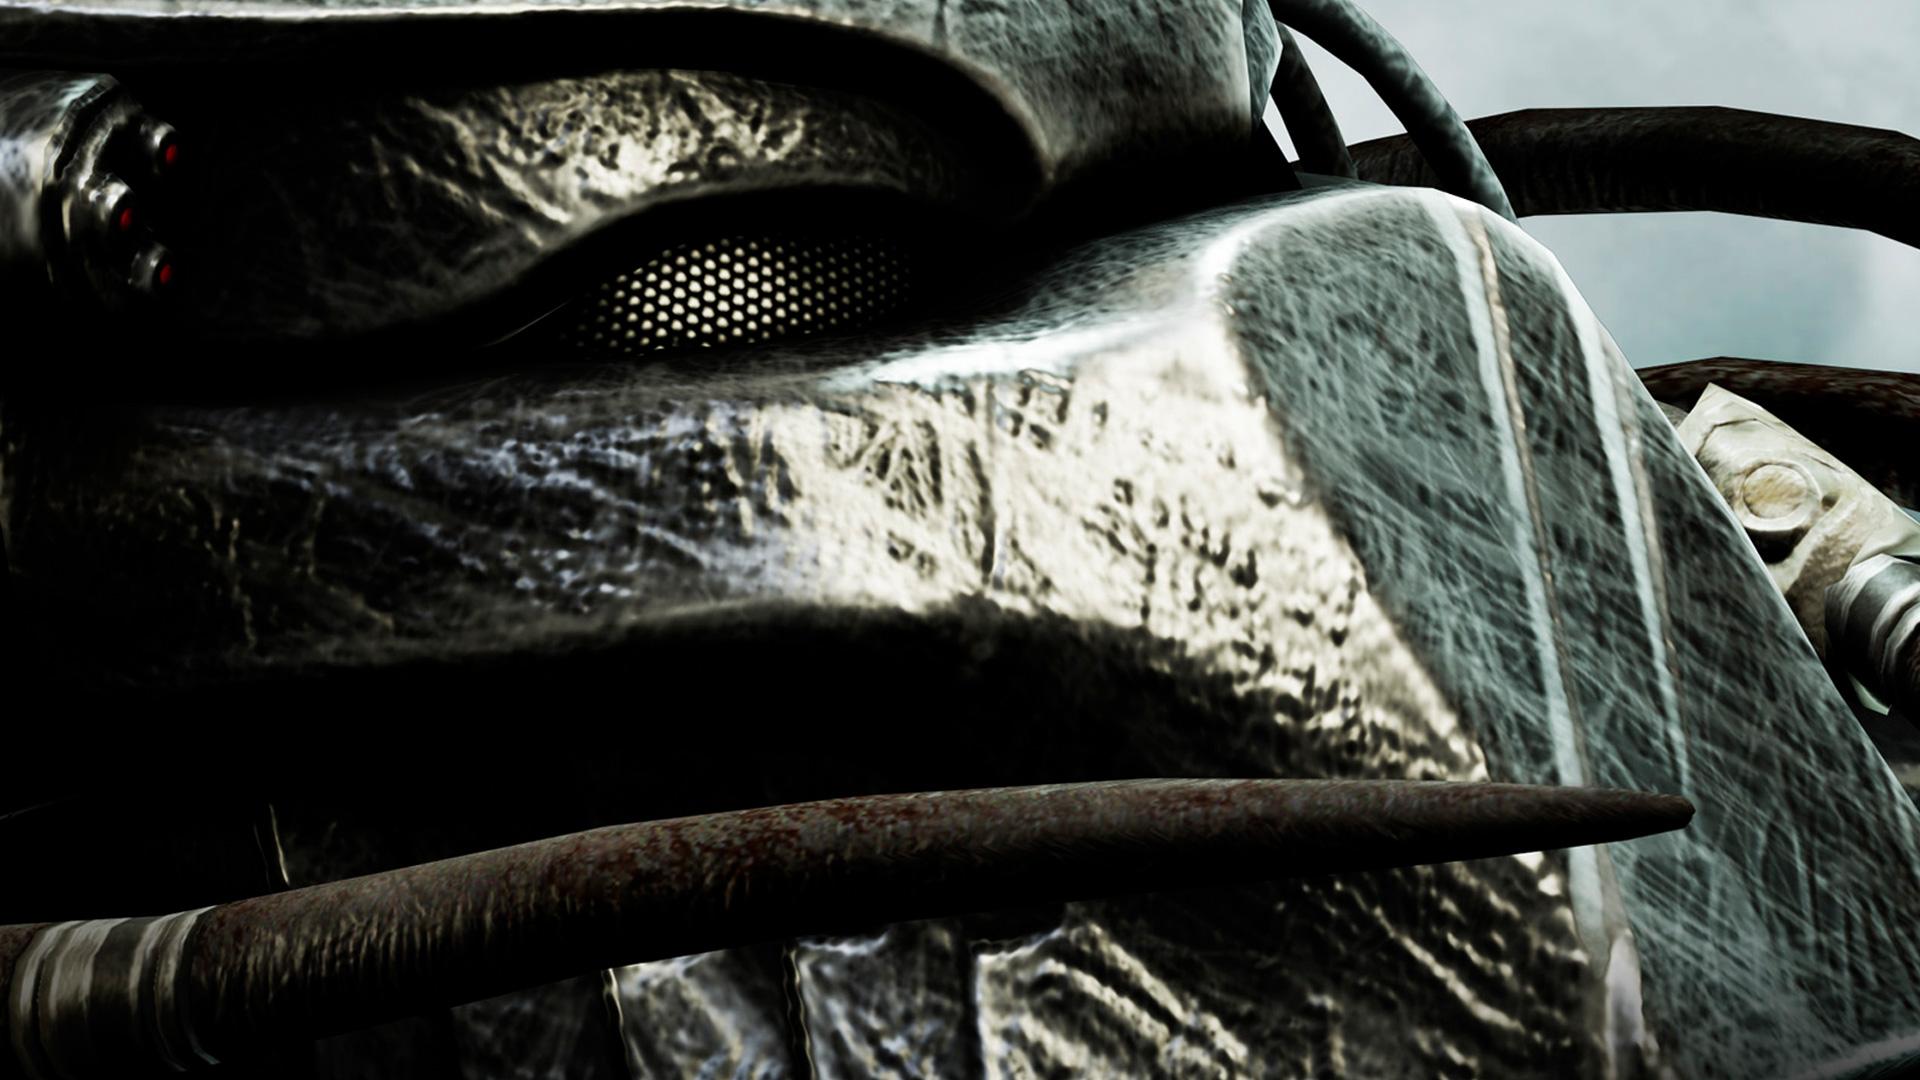 Alien Vs Predator Hd Wallpapers: Aliens Vs. Predator HD Wallpaper